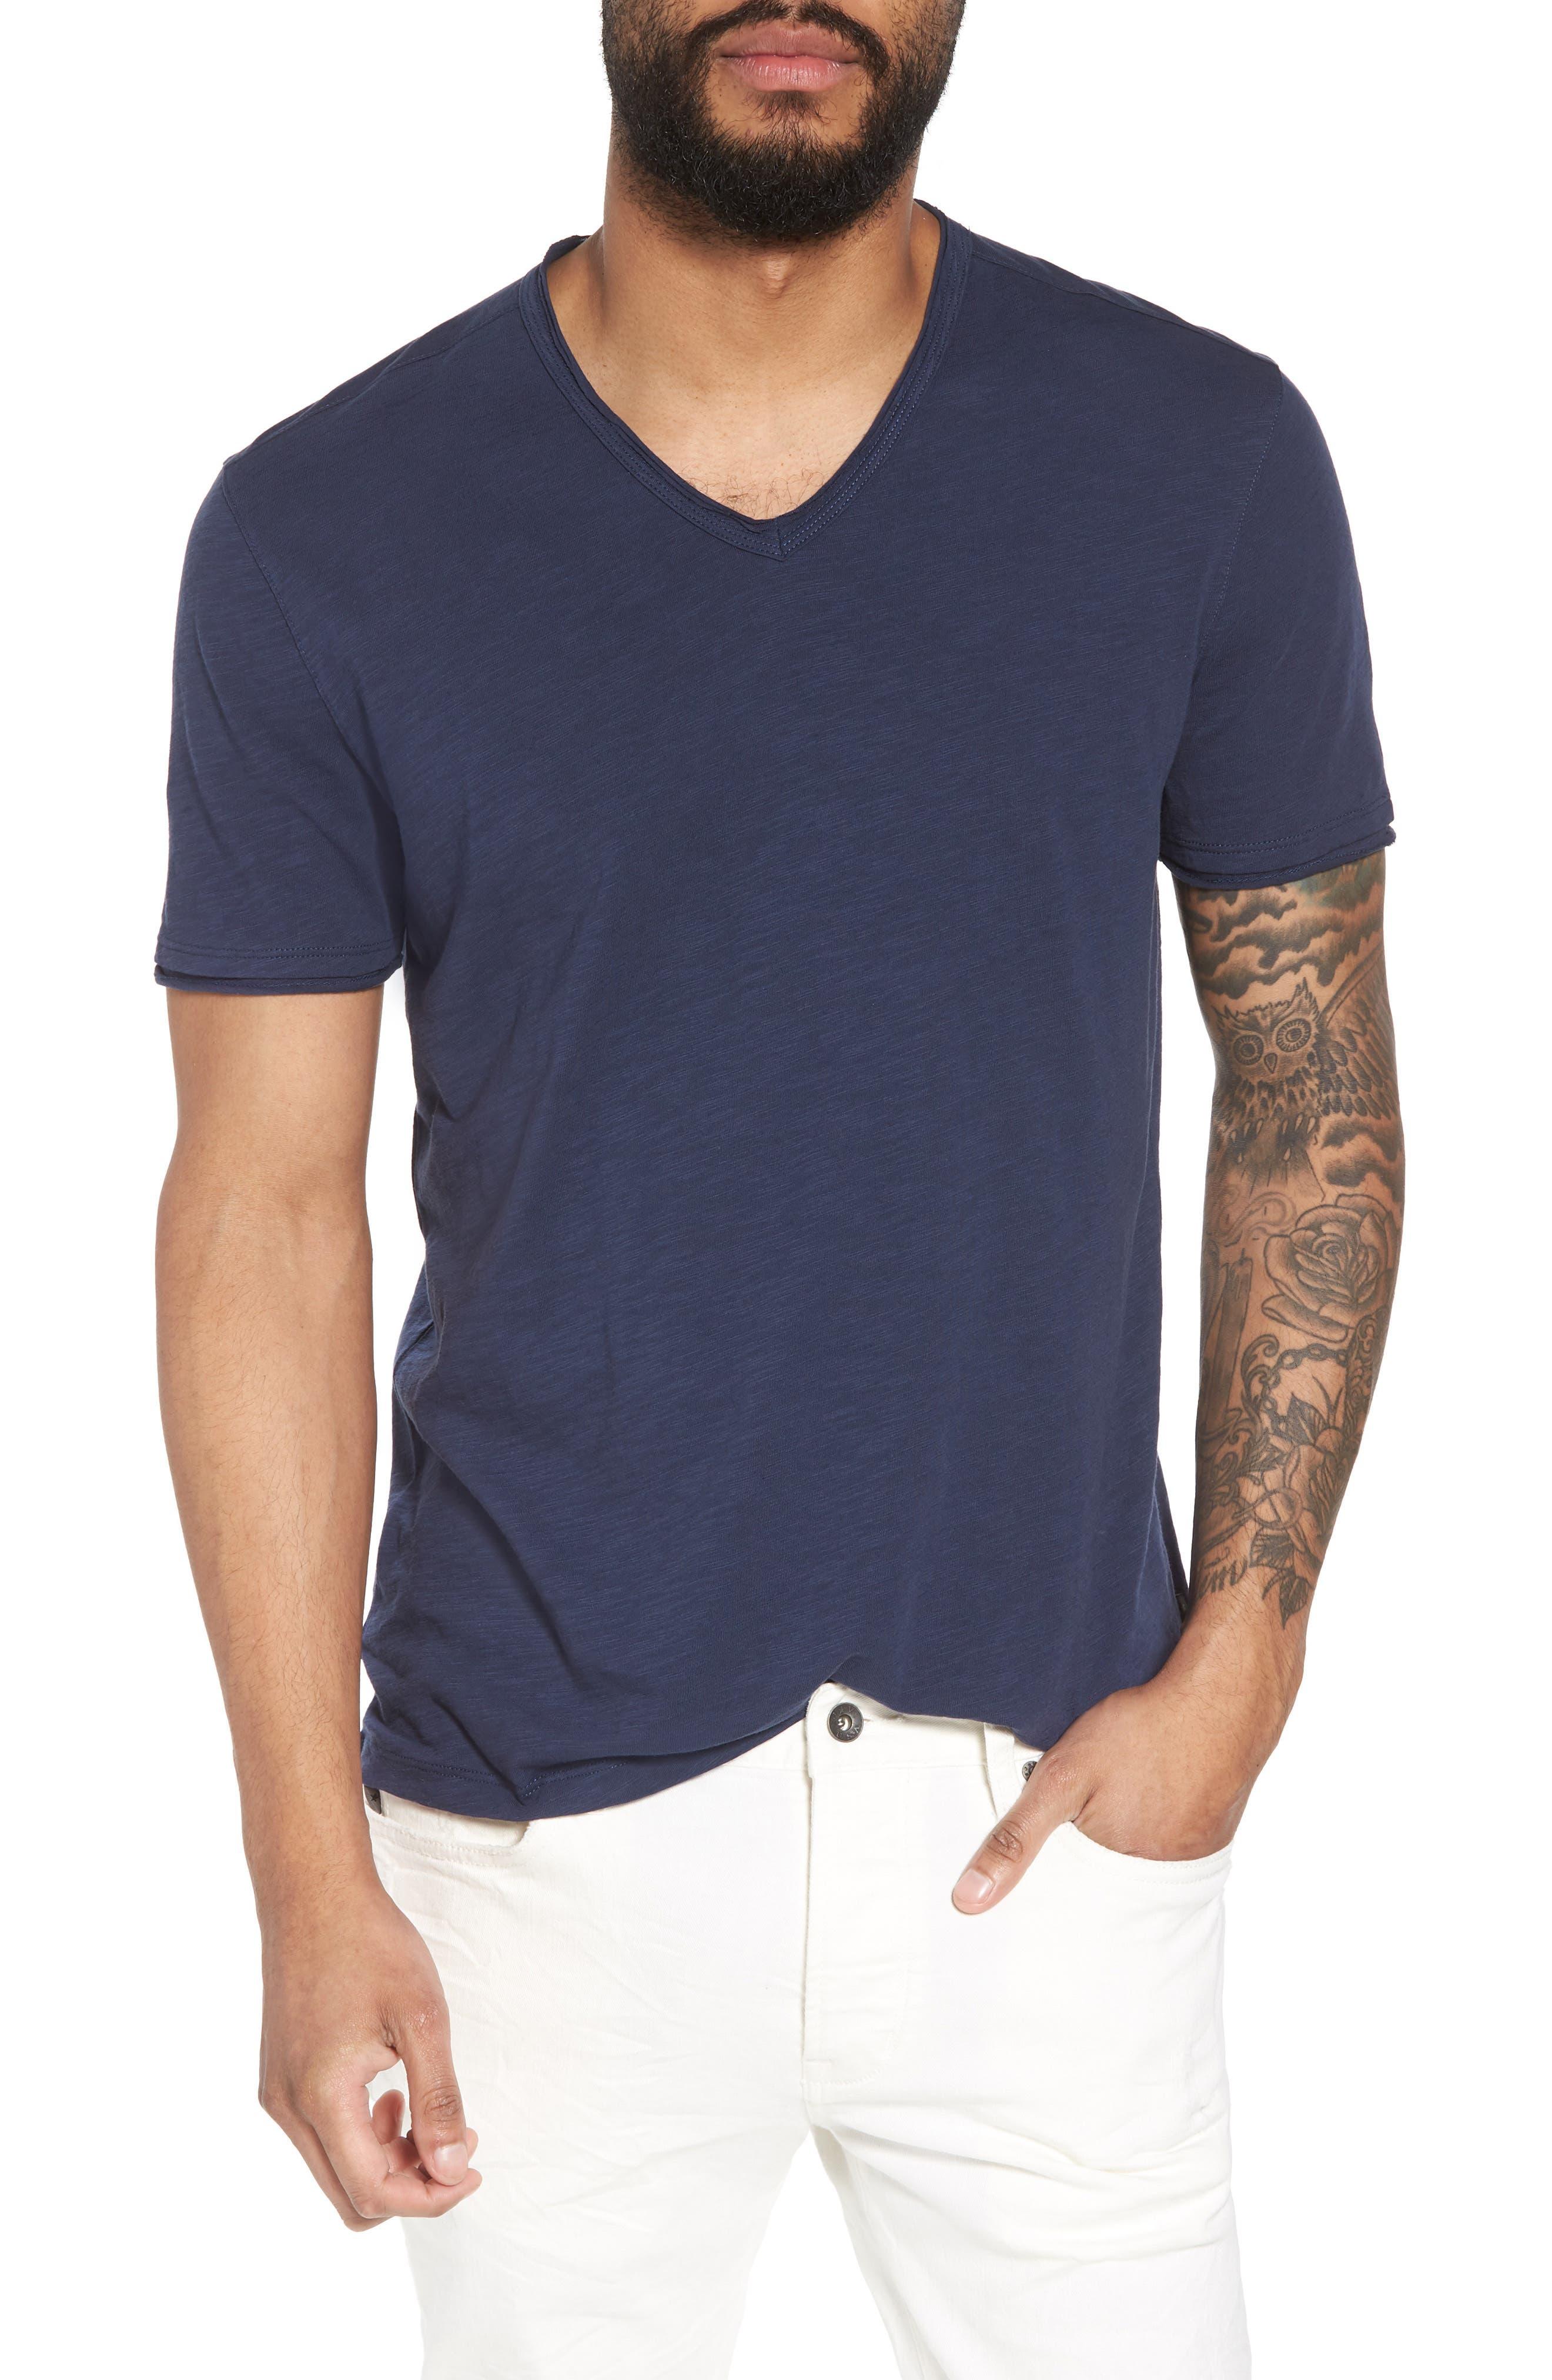 USA Clothing